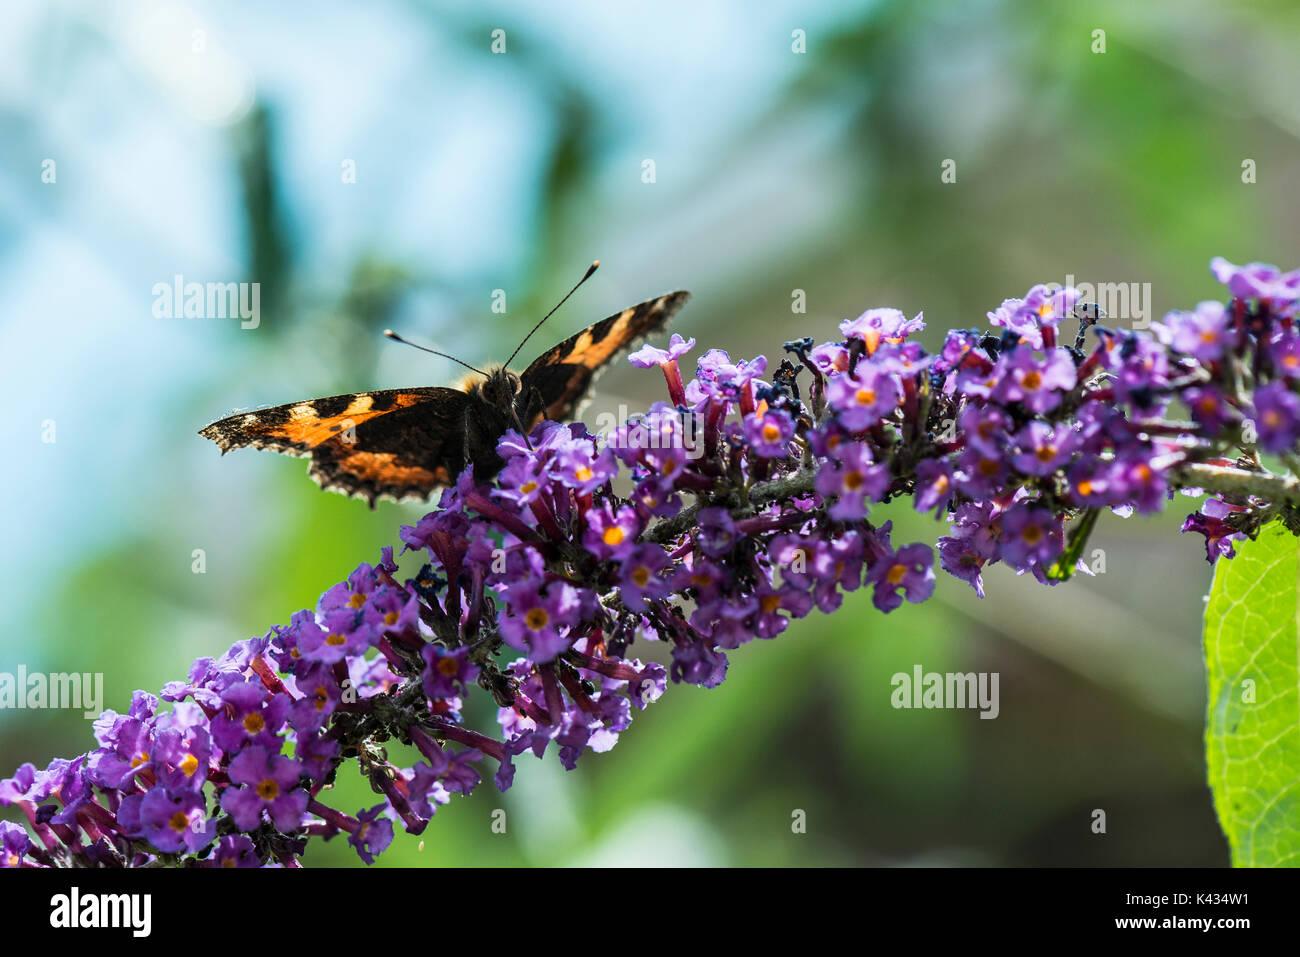 A small tortoiseshell butterfly (Aglais urticae) on a butterfly bush (buddleia) - Stock Image